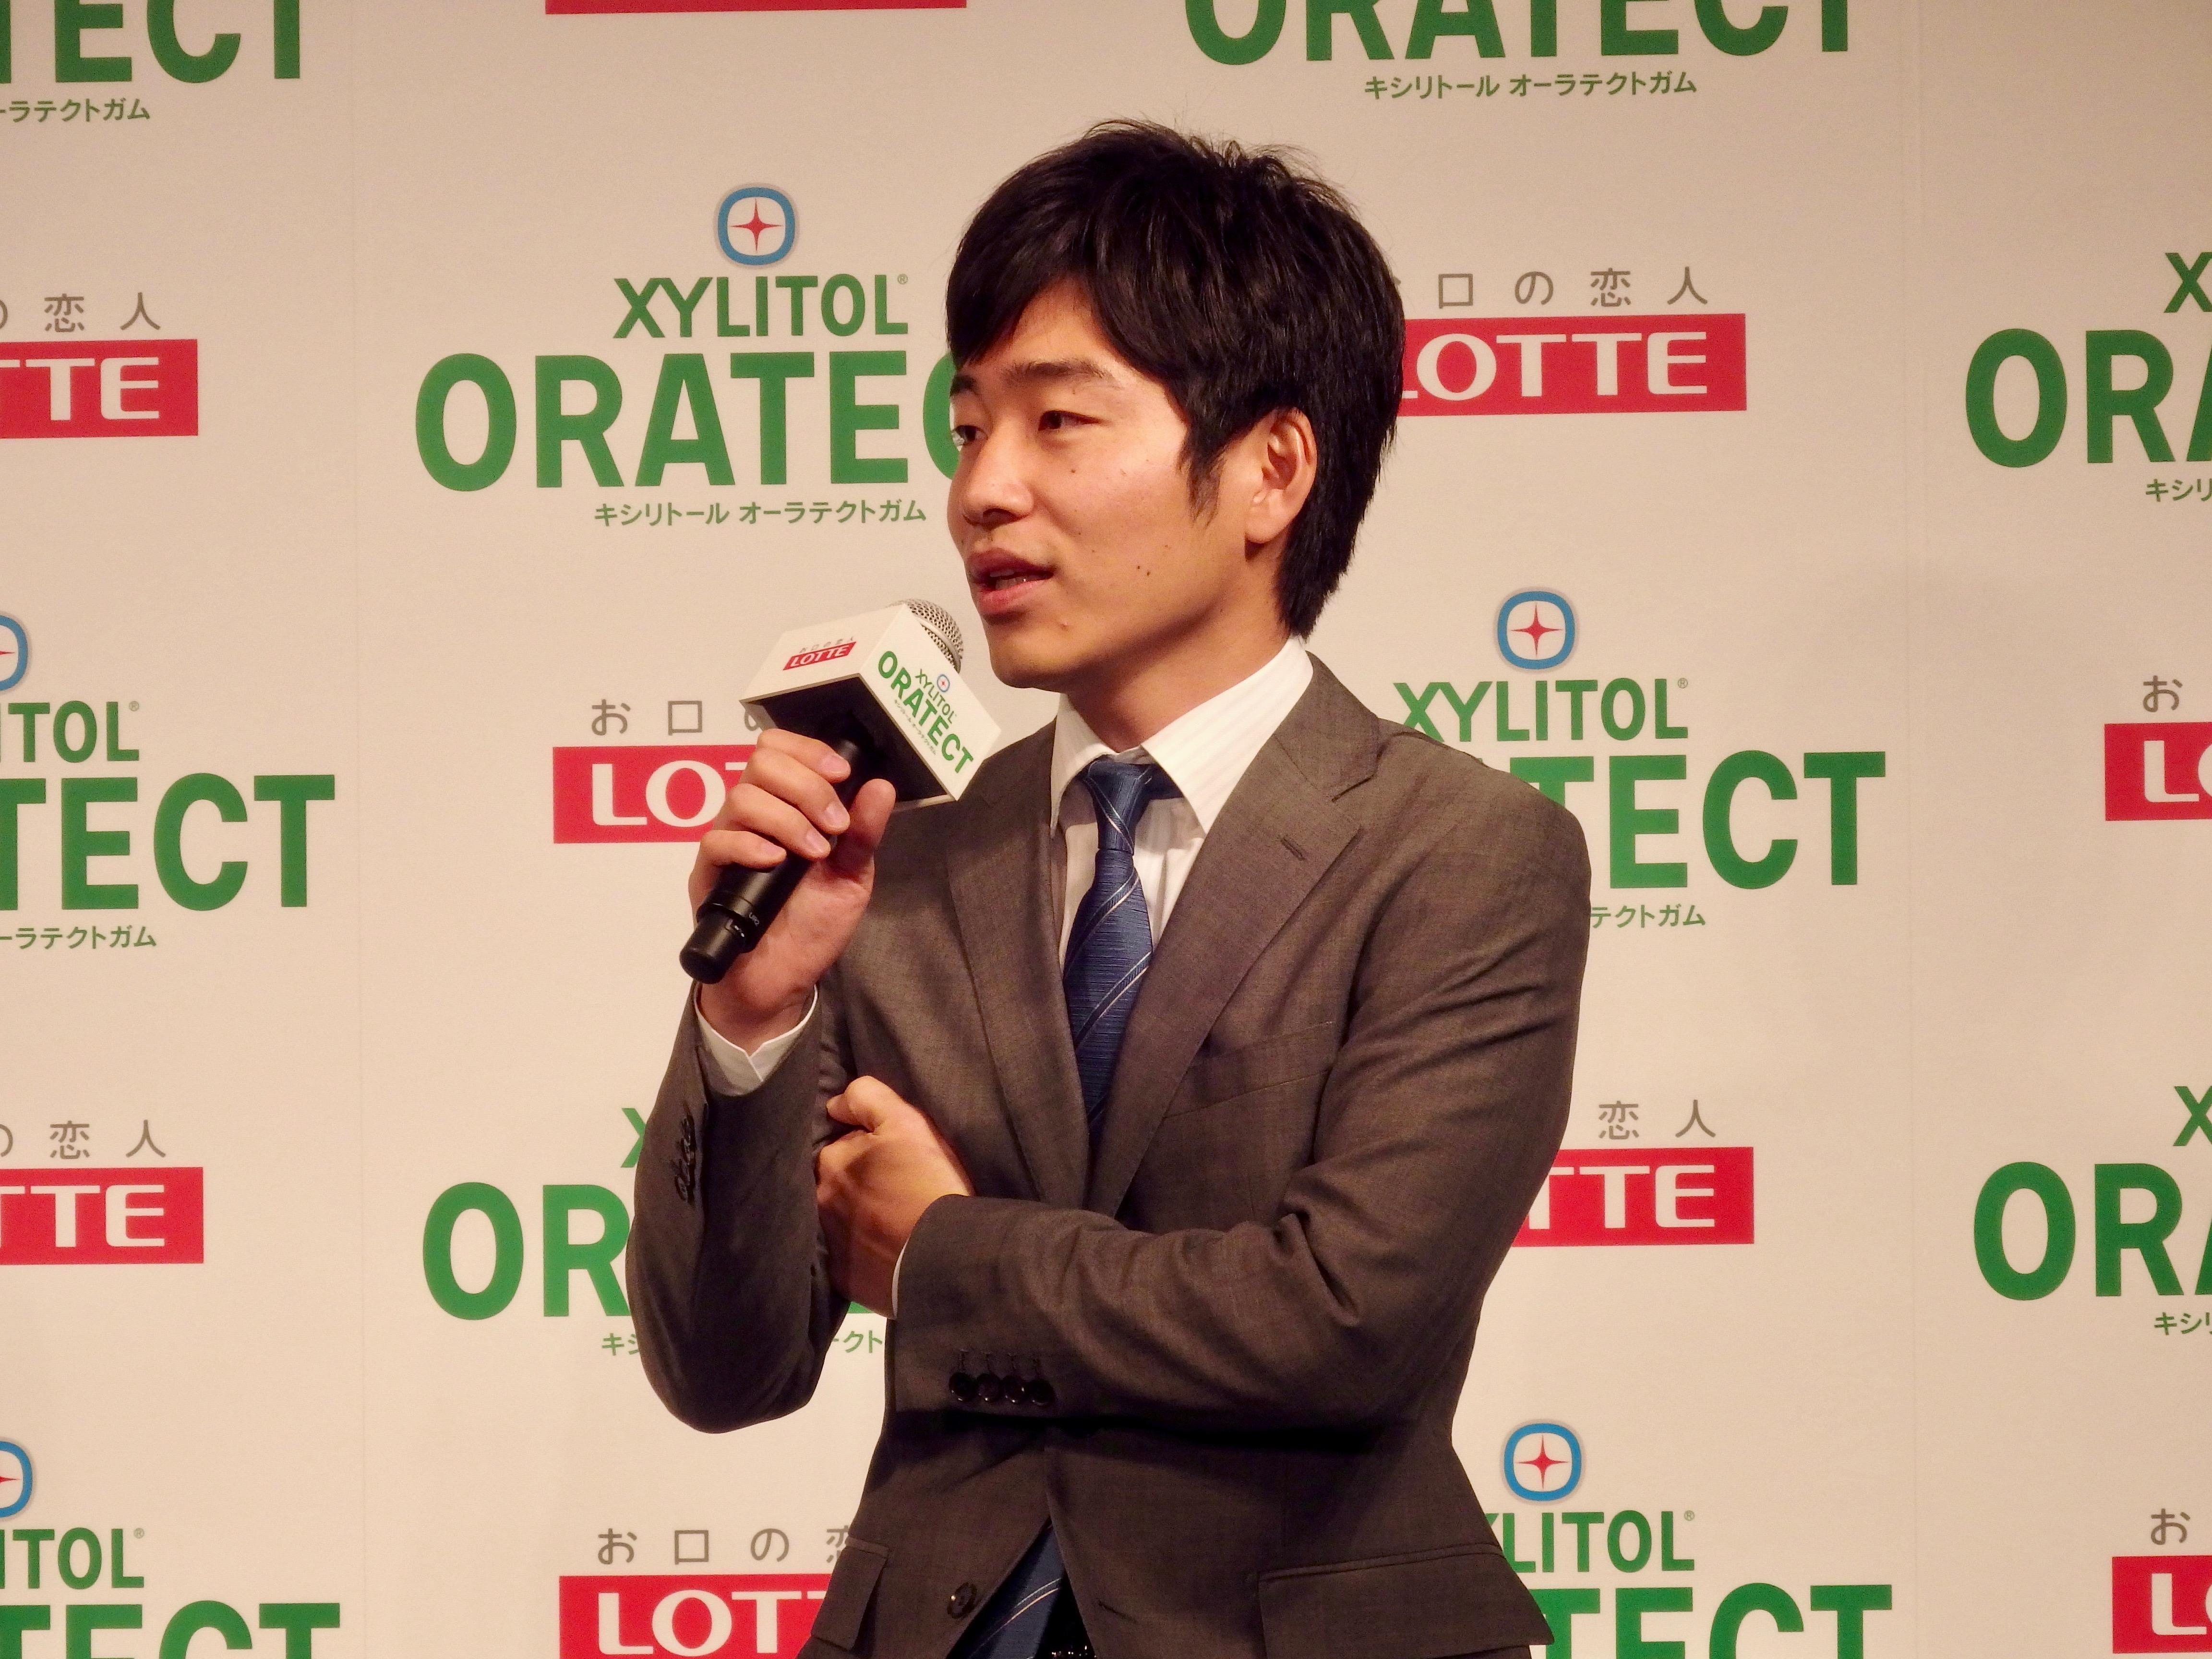 http://news.yoshimoto.co.jp/20170314200637-6c263dcf158f036be912149ef45b61baca36ea3e.jpg